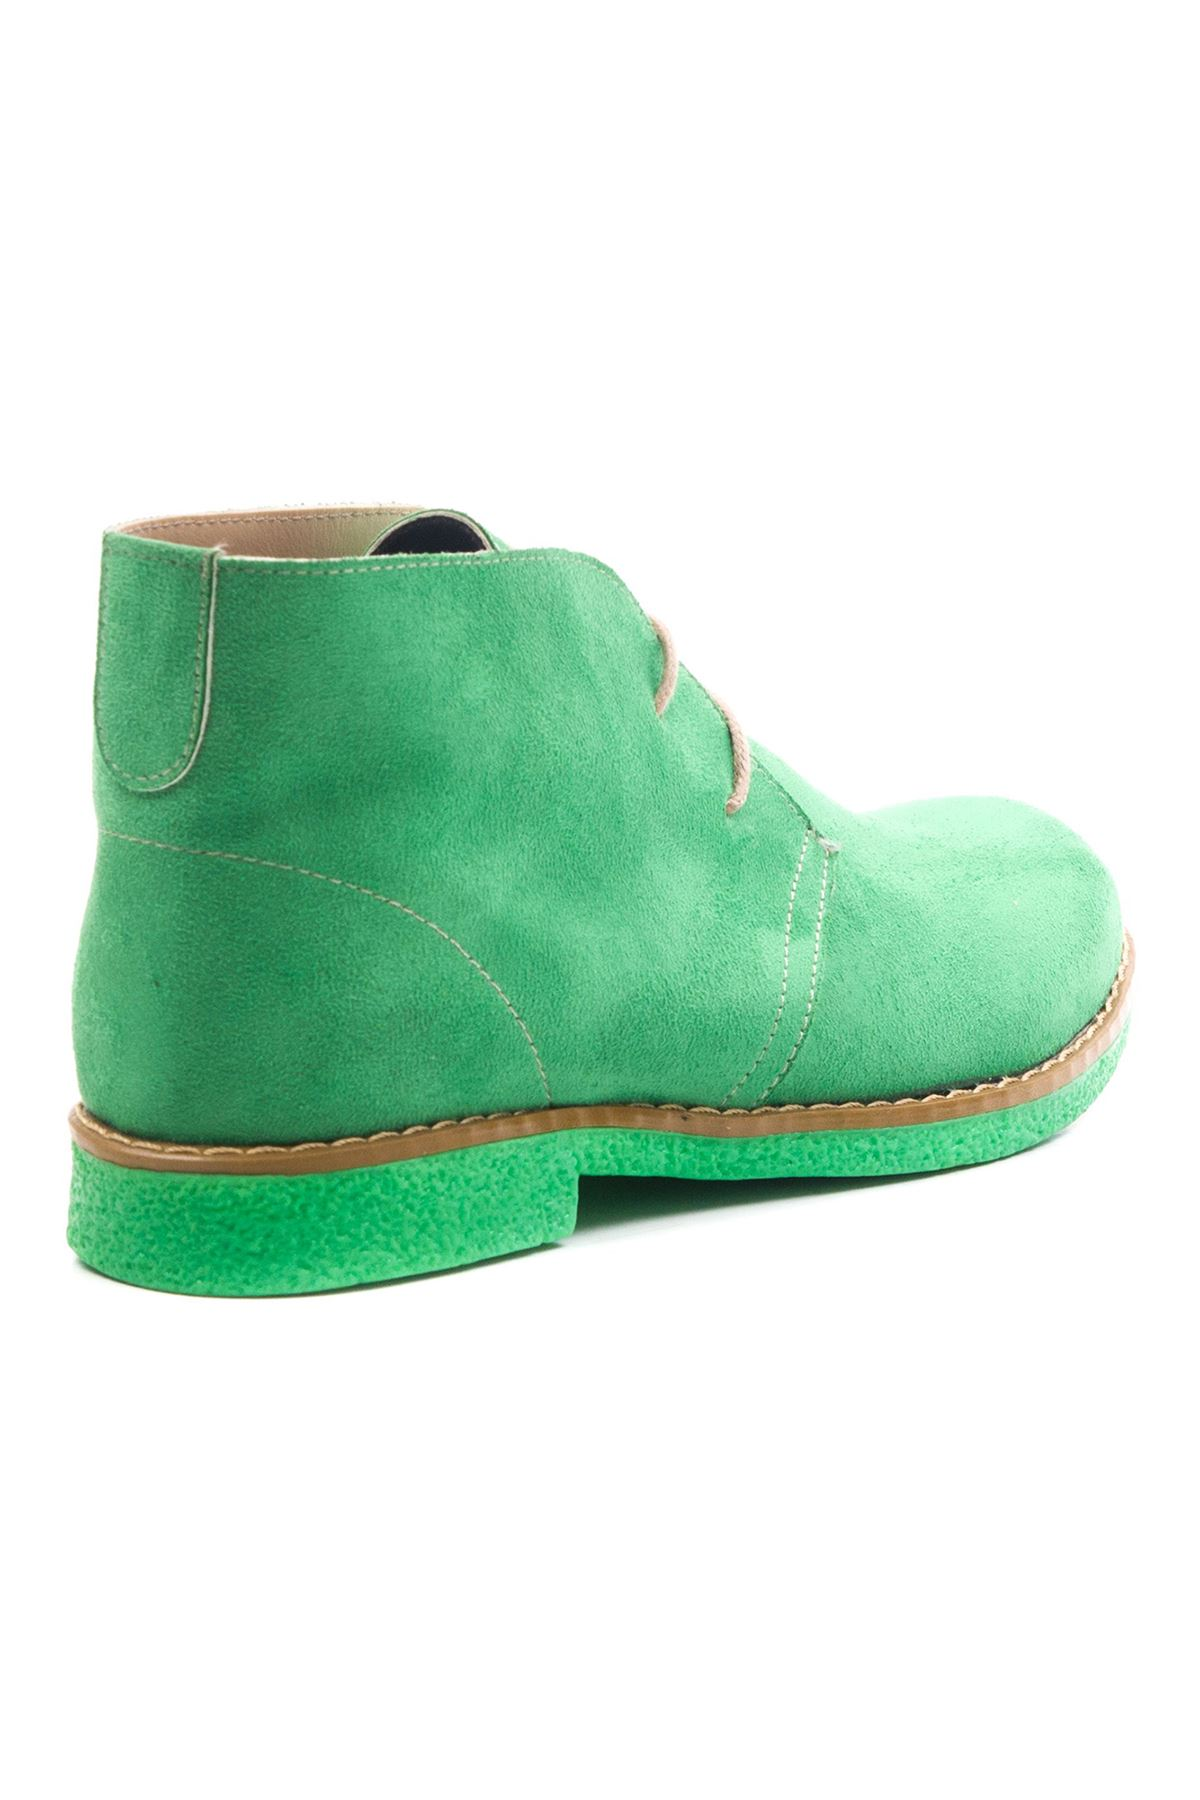 Ventricosa Kadın Bot Yeşil Süet Yeşil Taban